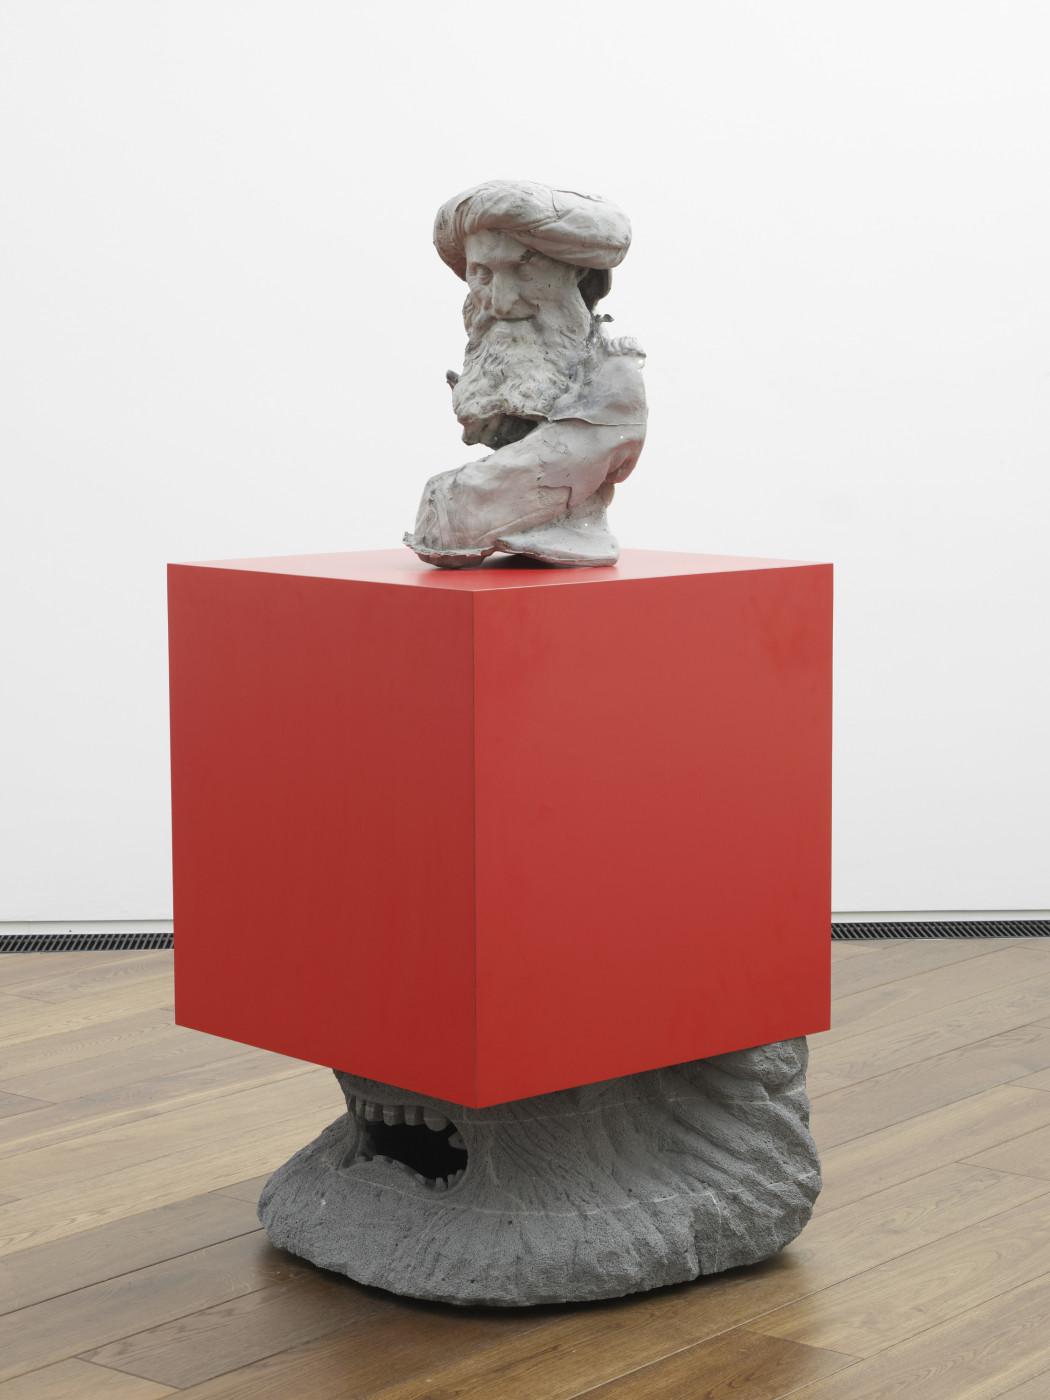 "<div class=""artwork_caption""><div class=""title""><em>'Who conjured you out of the clay?'</em>, 2012</div><div class=""medium"">Thermalite, Formica, polyurethane foam, ceramic, parcel tape</div><div class=""dimensions"">138.0 x 60.0 x 60.0 cm<br />54 3/8 x 23 5/8 x 23 5/8 in.</div></div>"